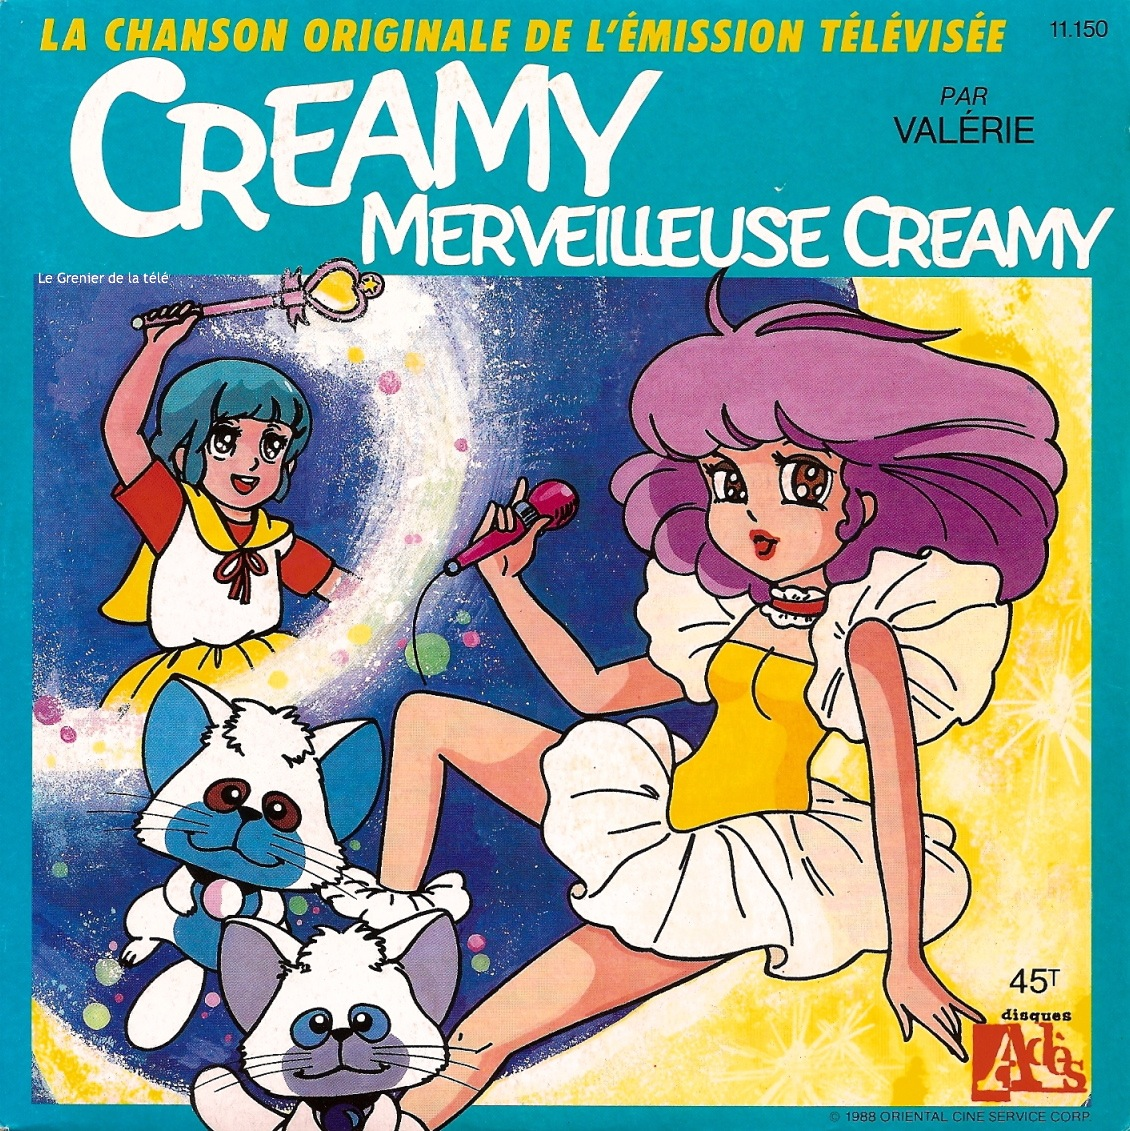 http://grenierdelatv.free.fr/2/creamy.jpg